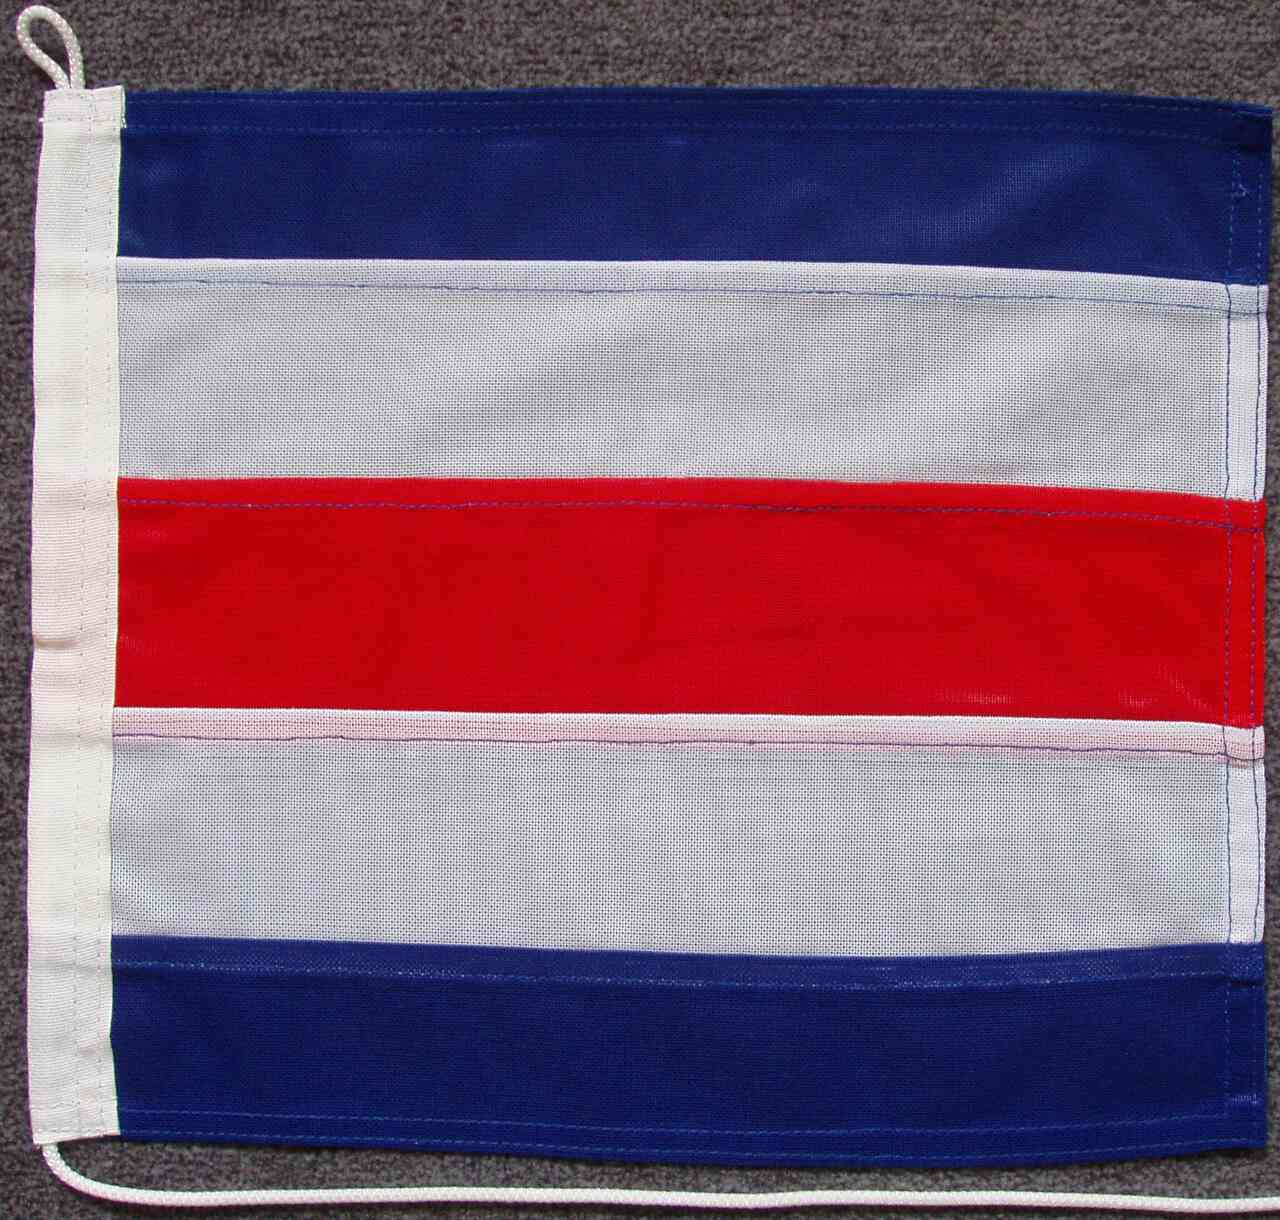 Signalflagge C - Charlie